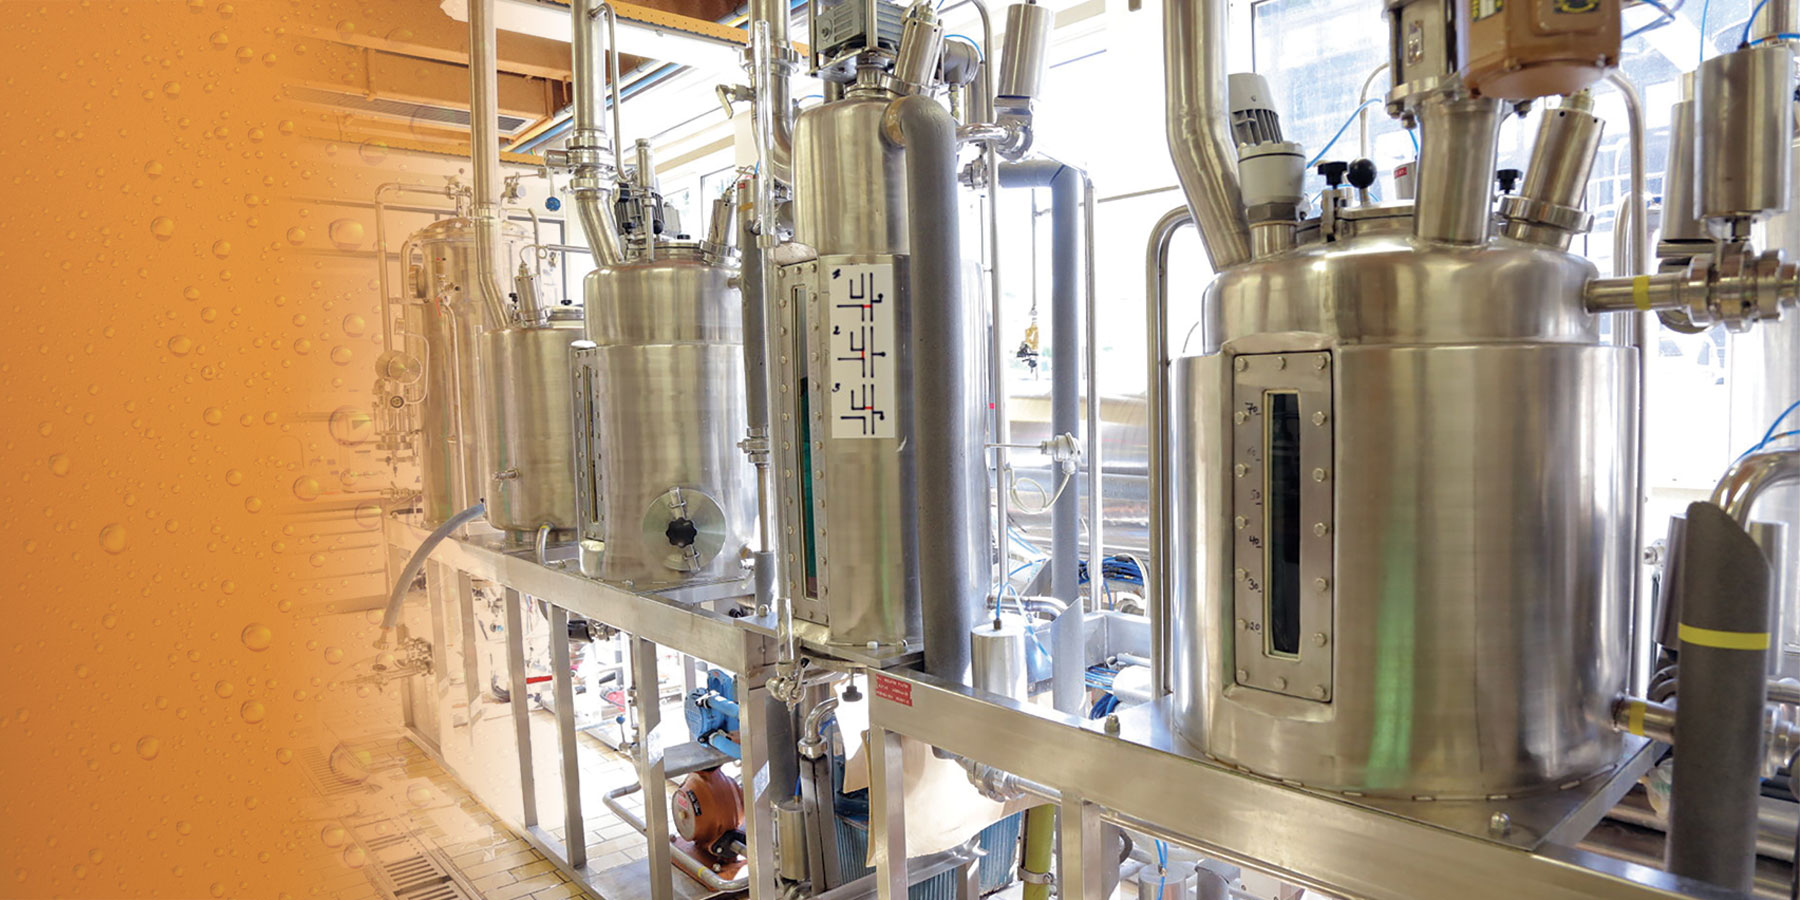 Automated Brewing Lab Helps Hone Biochemistry Skills